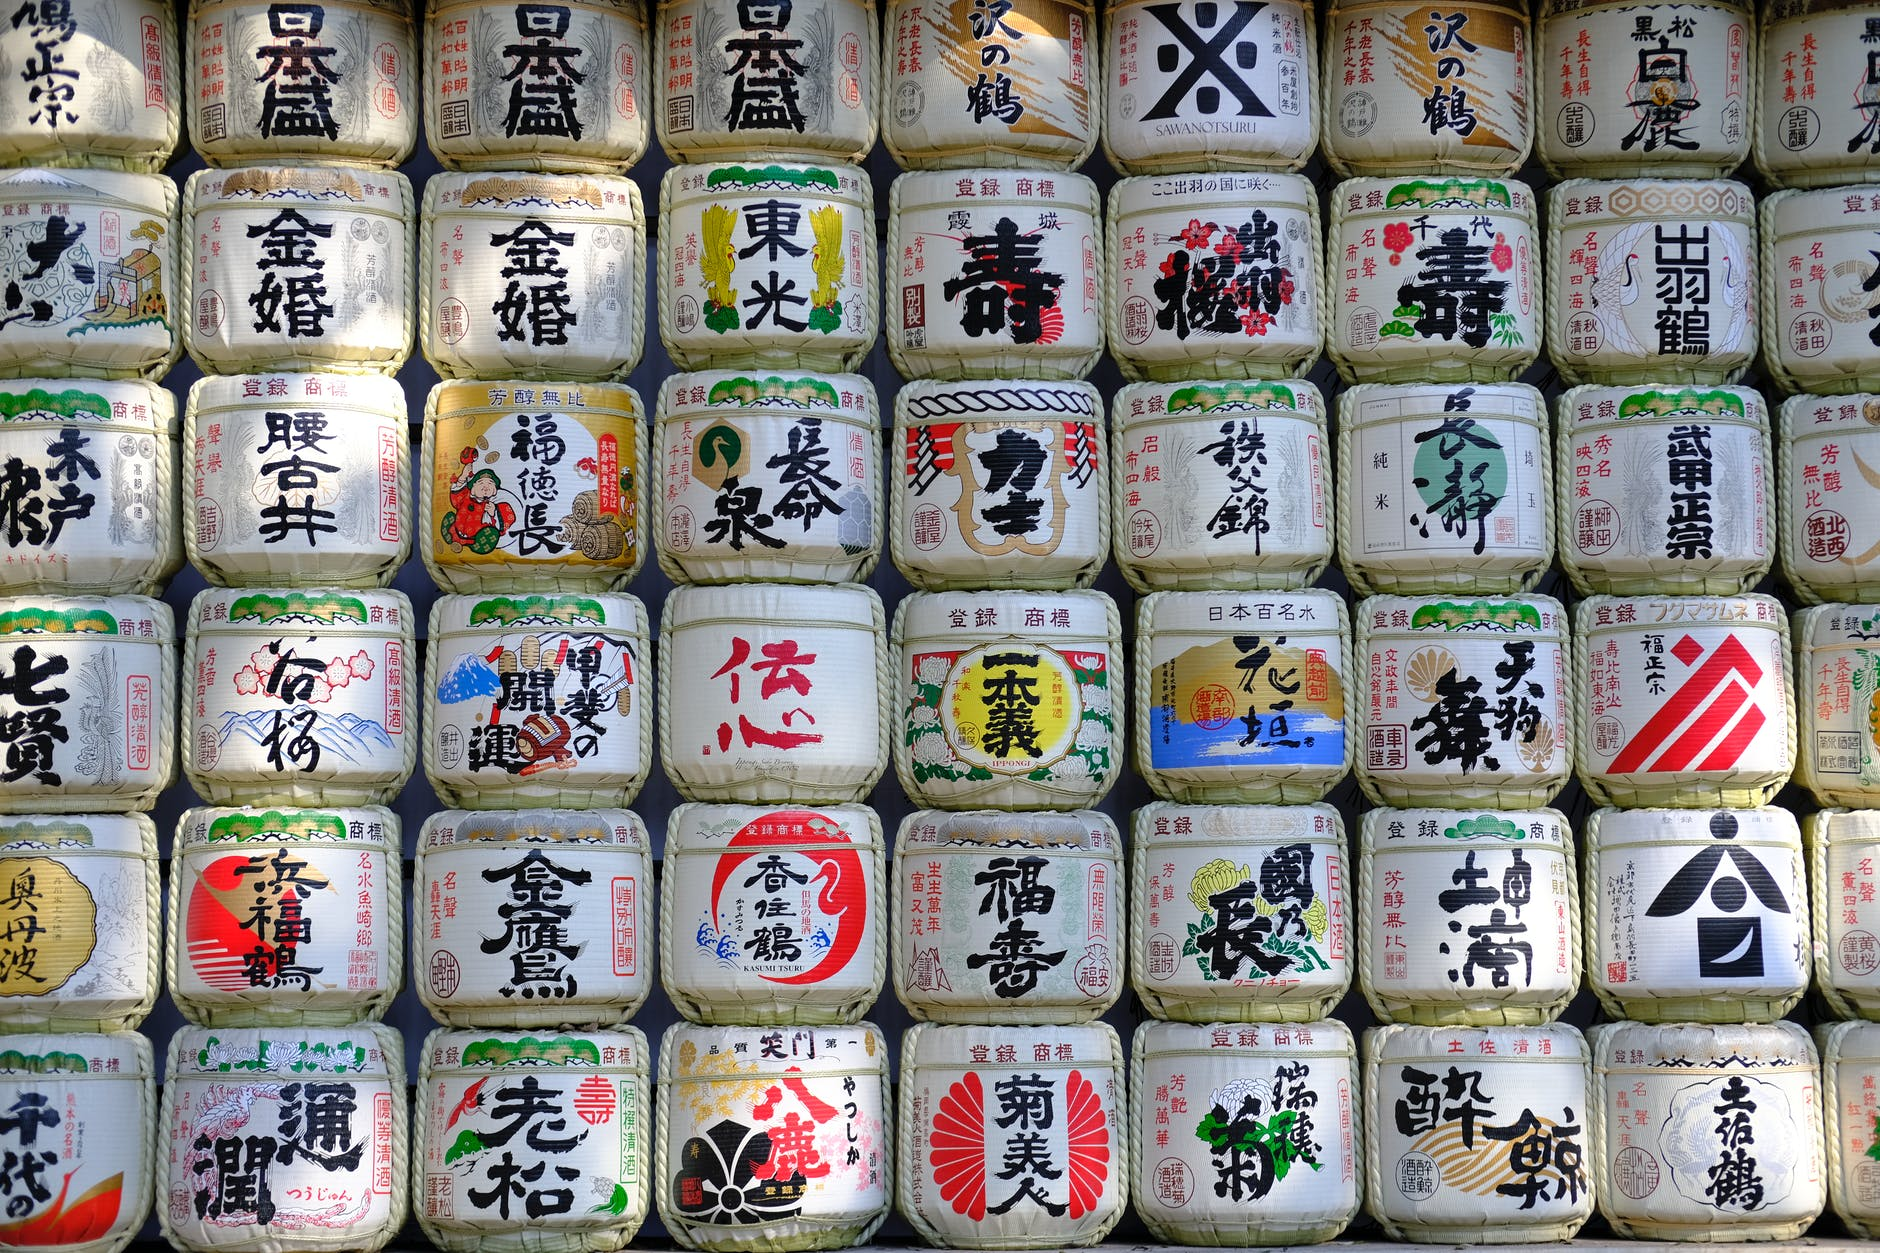 stack of various asian tea jars